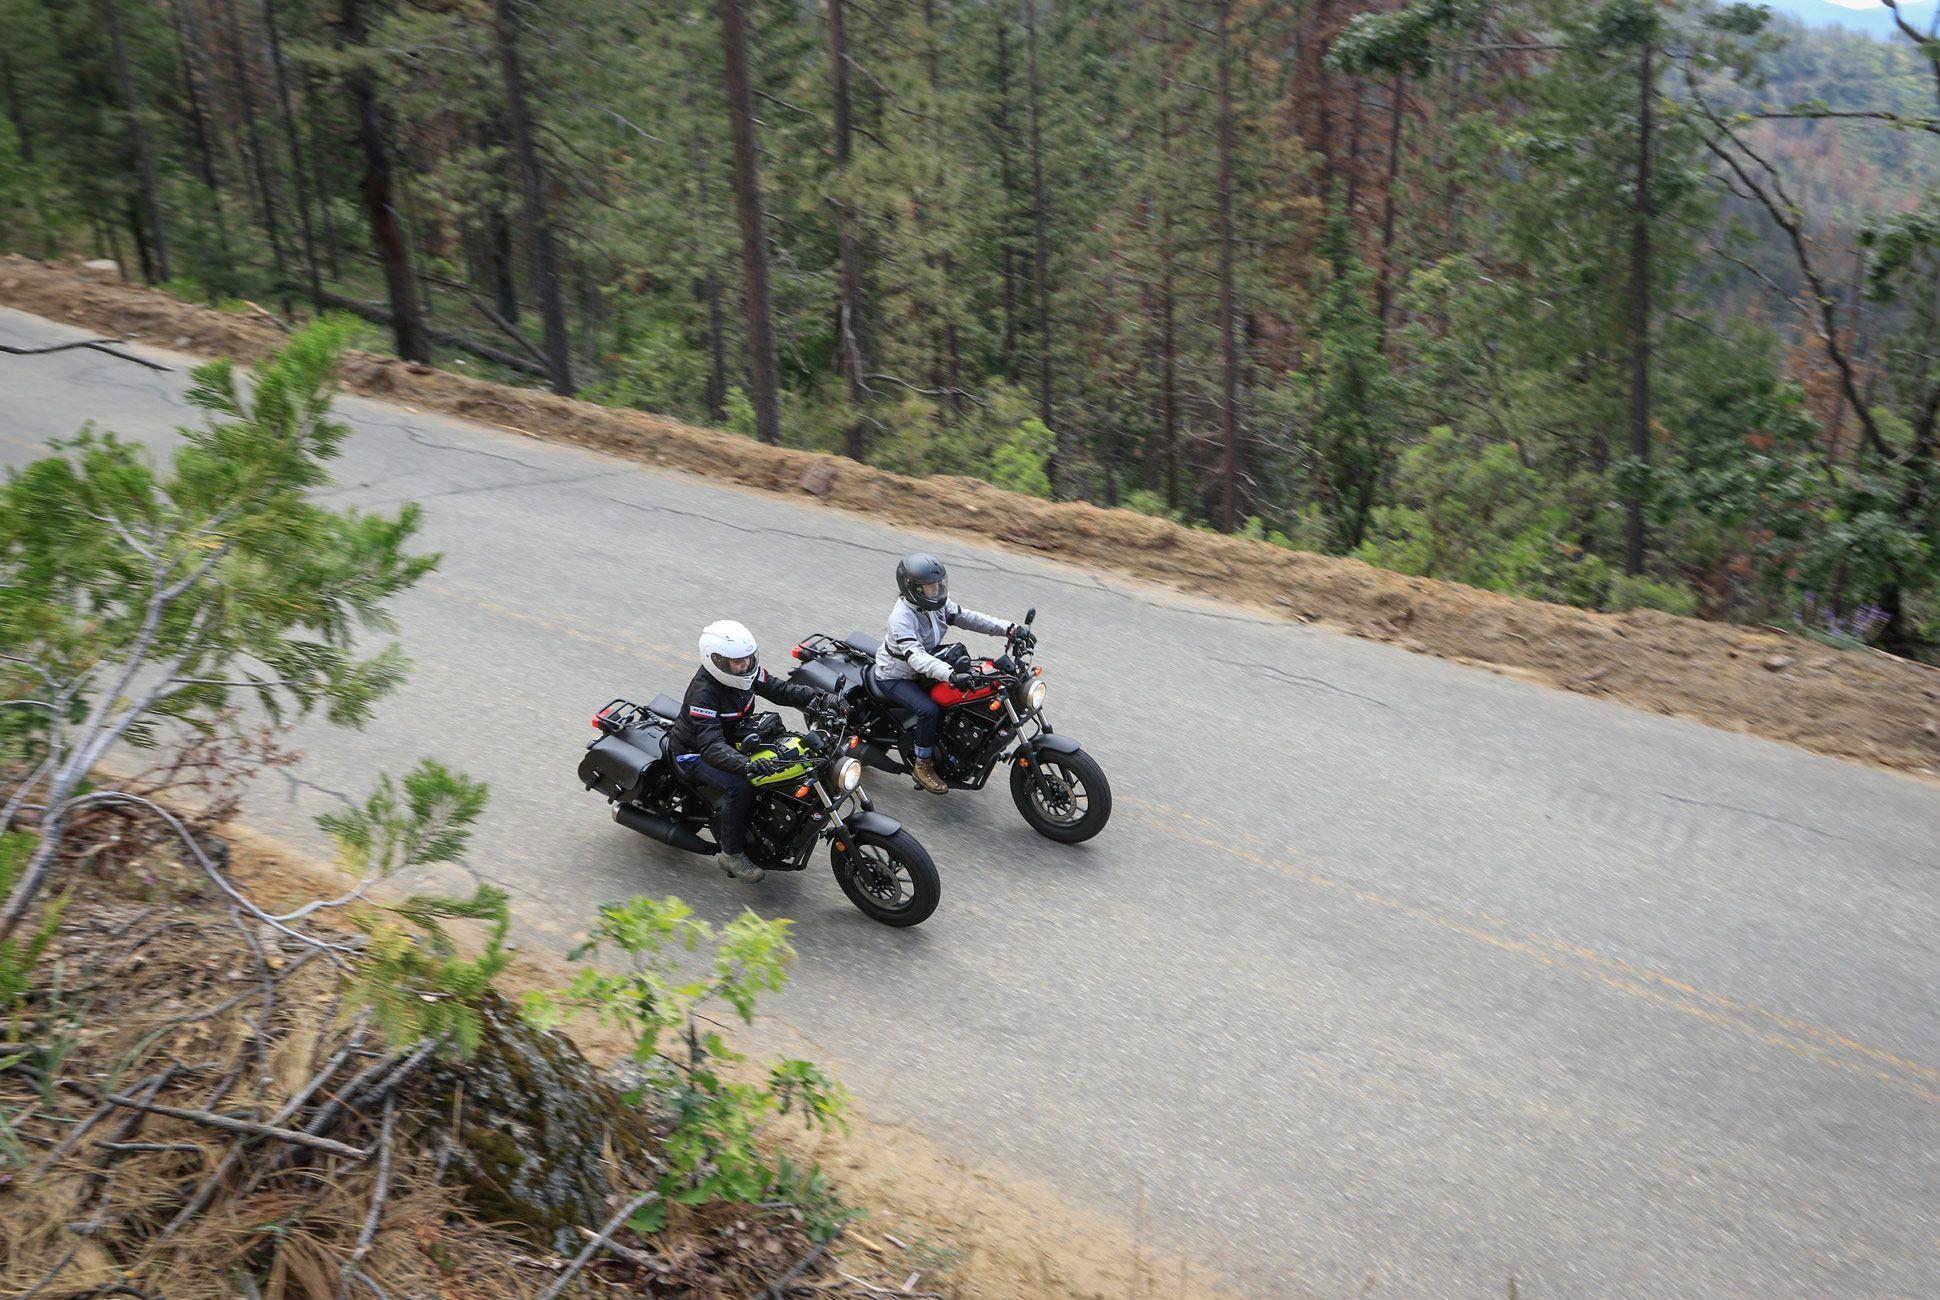 Small-Displacement-Bikes-Gear-Patrol-Slide-4